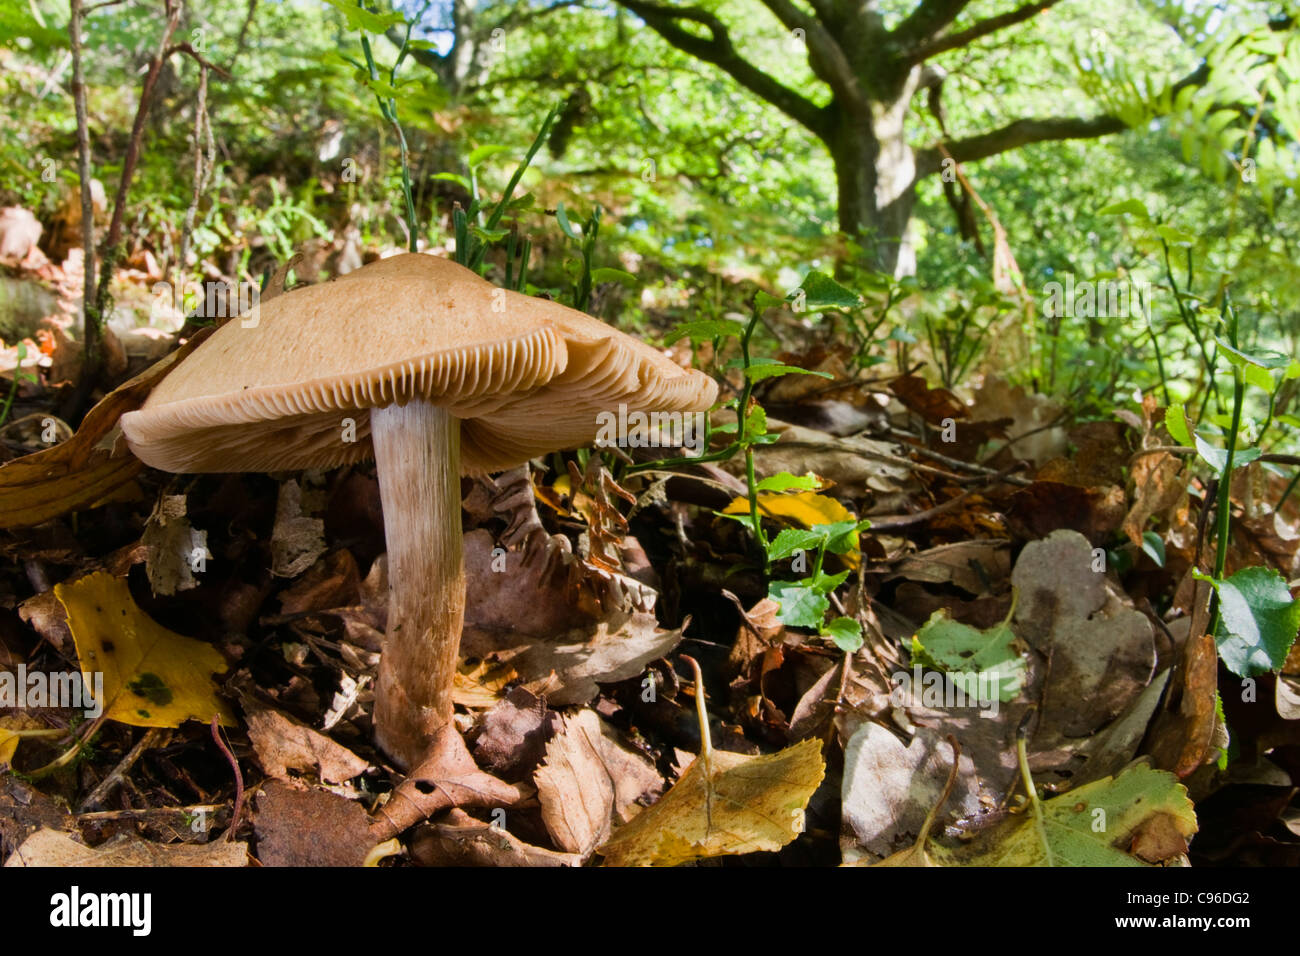 Fungi growing amongst leaf litter in oak woodland - Stock Image